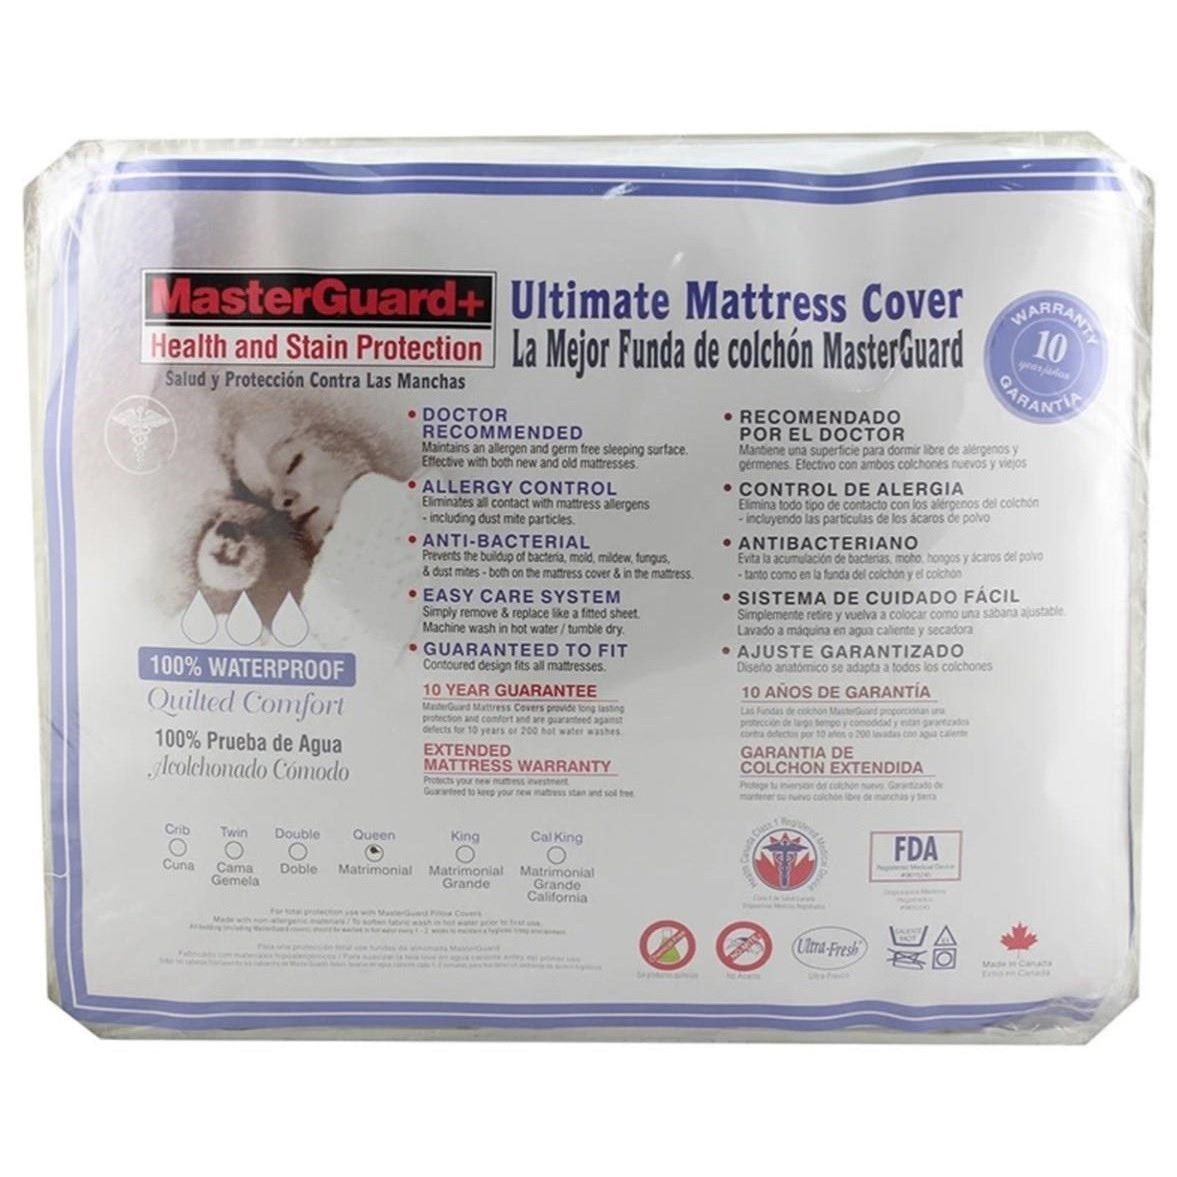 Eastern King Luxury Mattress Protector